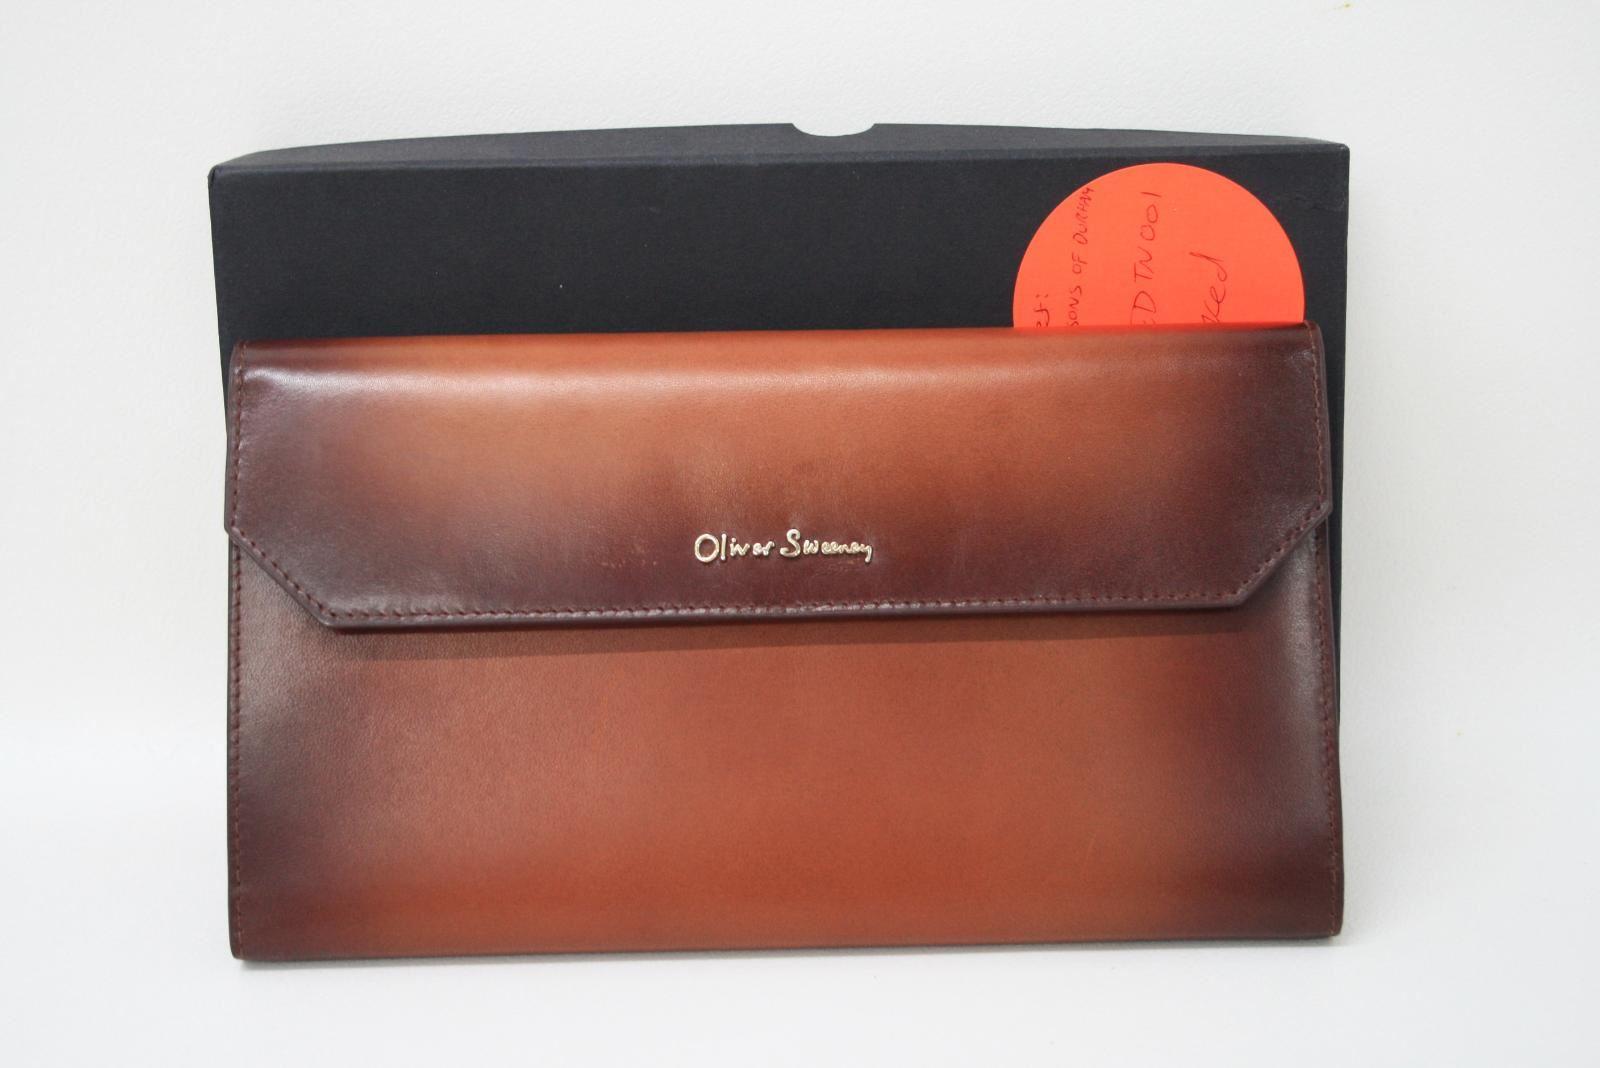 OLIVER-SWEENEY-Men-039-s-Purtington-Dark-Tan-Brown-Leather-Travel-Wallet-NEW